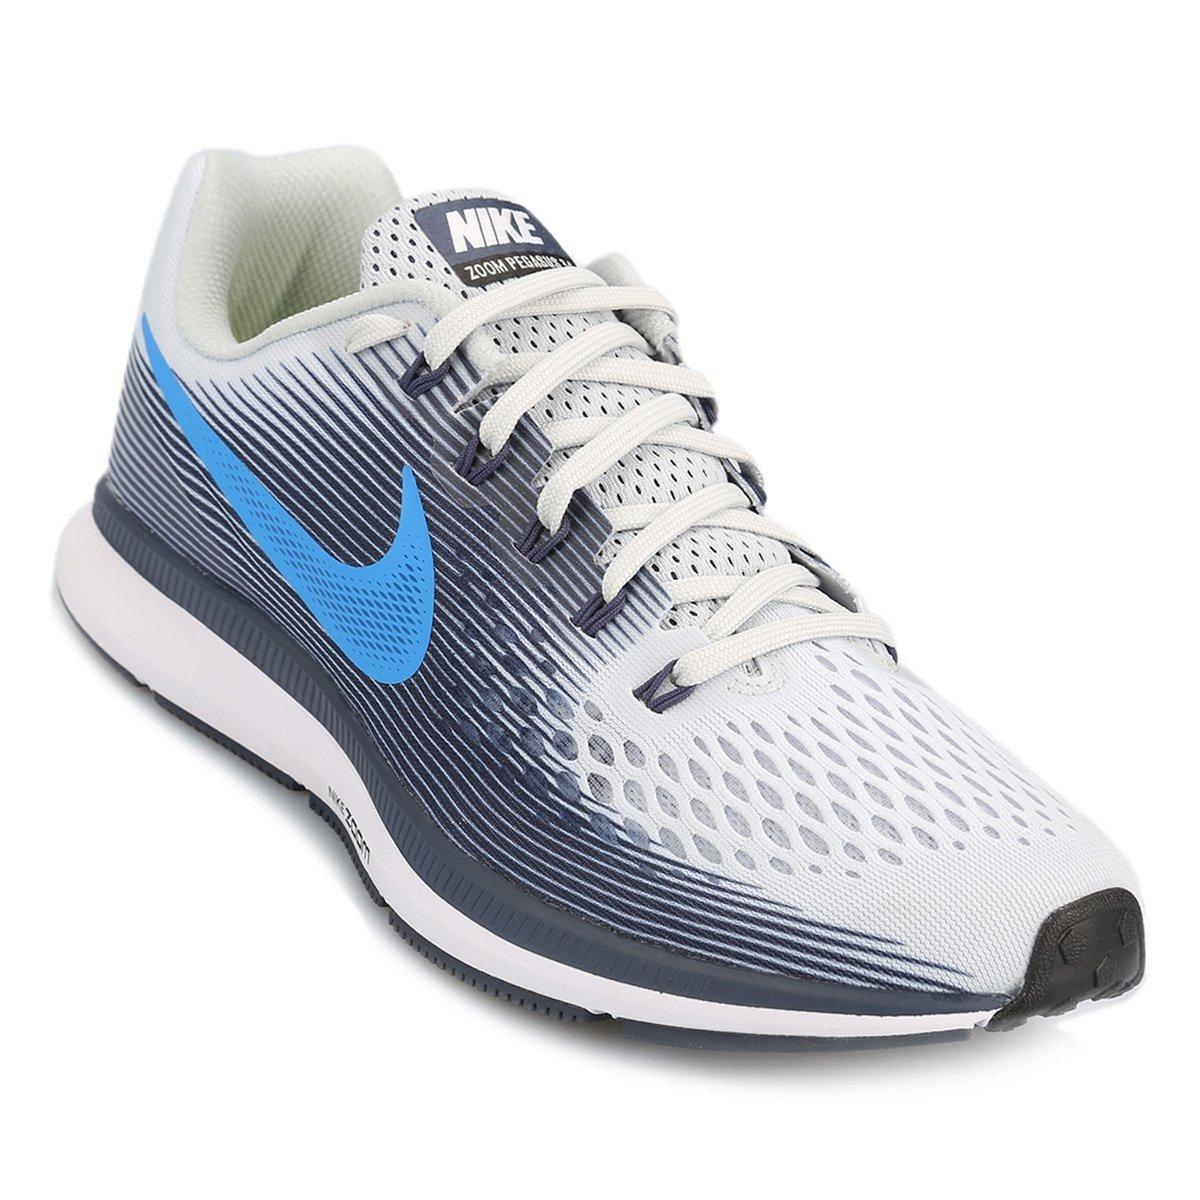 589332bb84a75 Zapatillas Nike Air Zoom Pegasus 34 M 880555-008 -   3.800